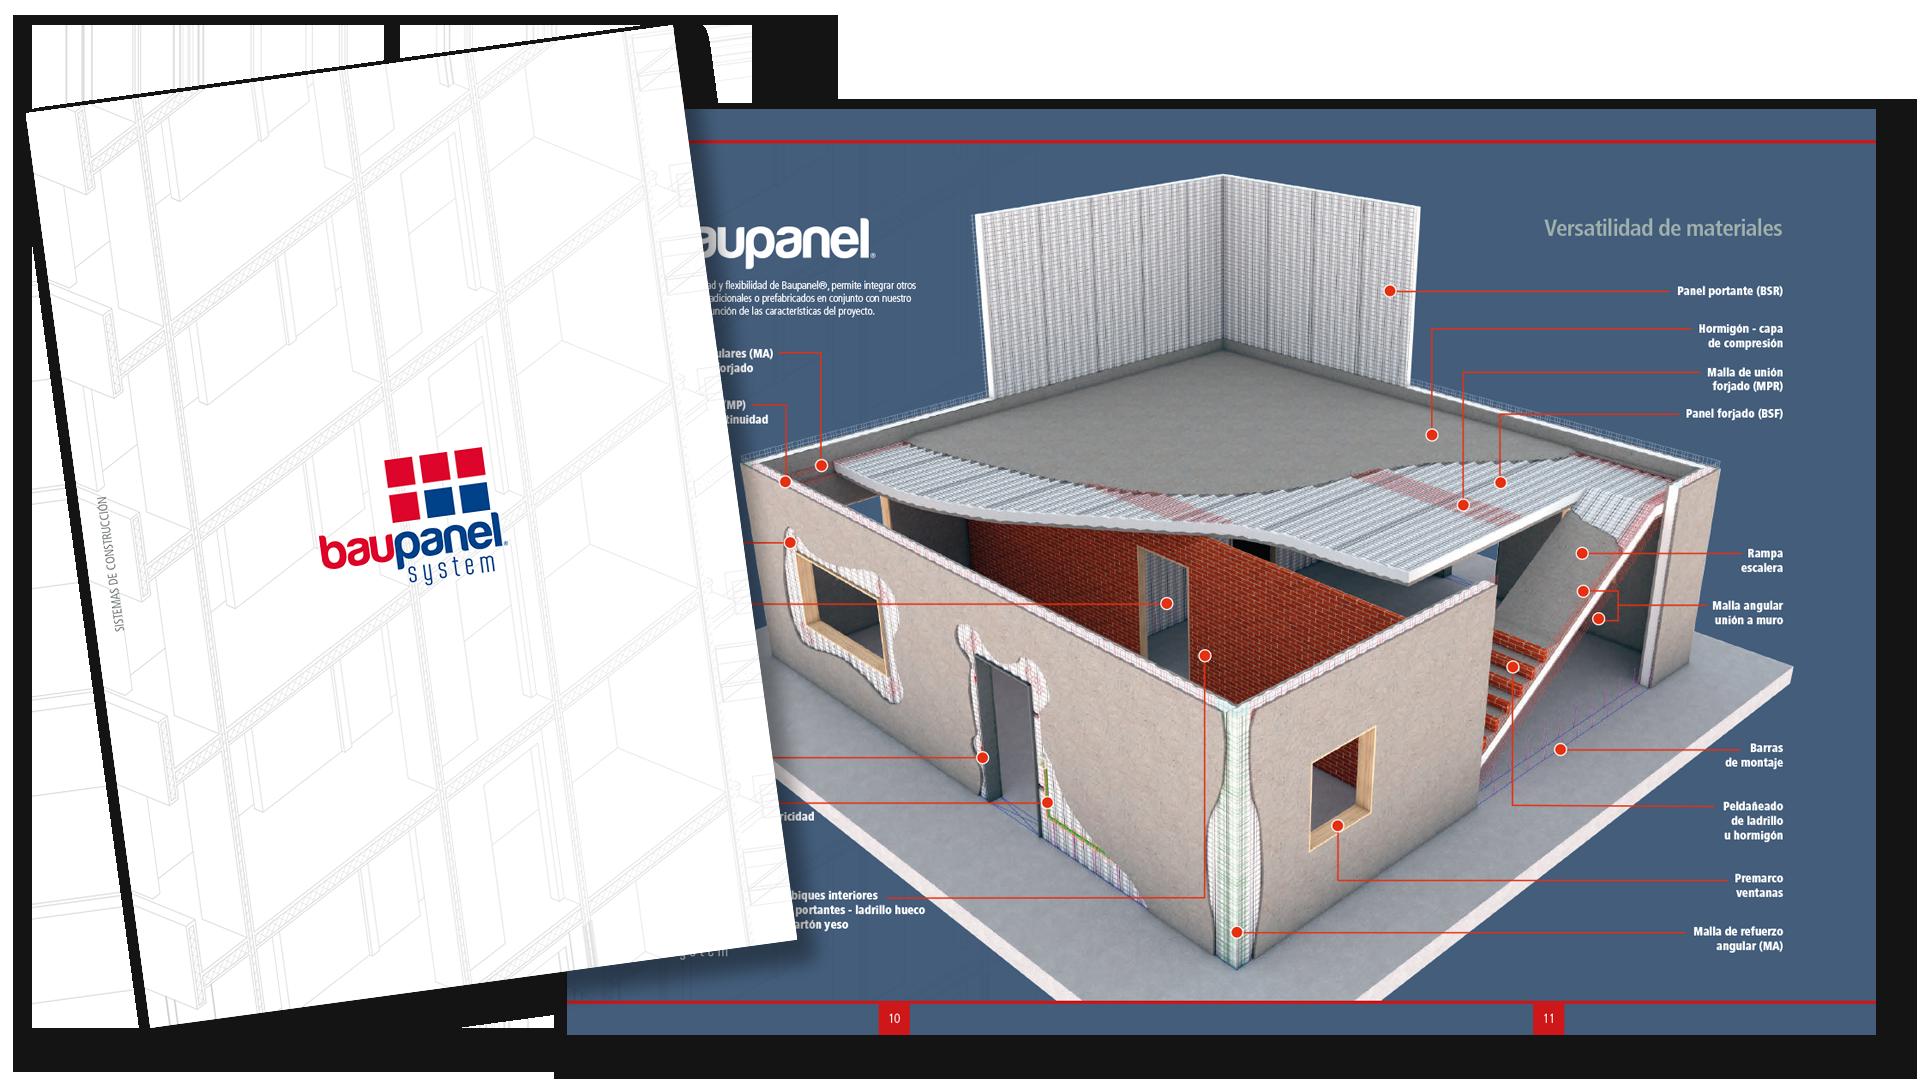 Catálogo Principal Baupanel System 2018